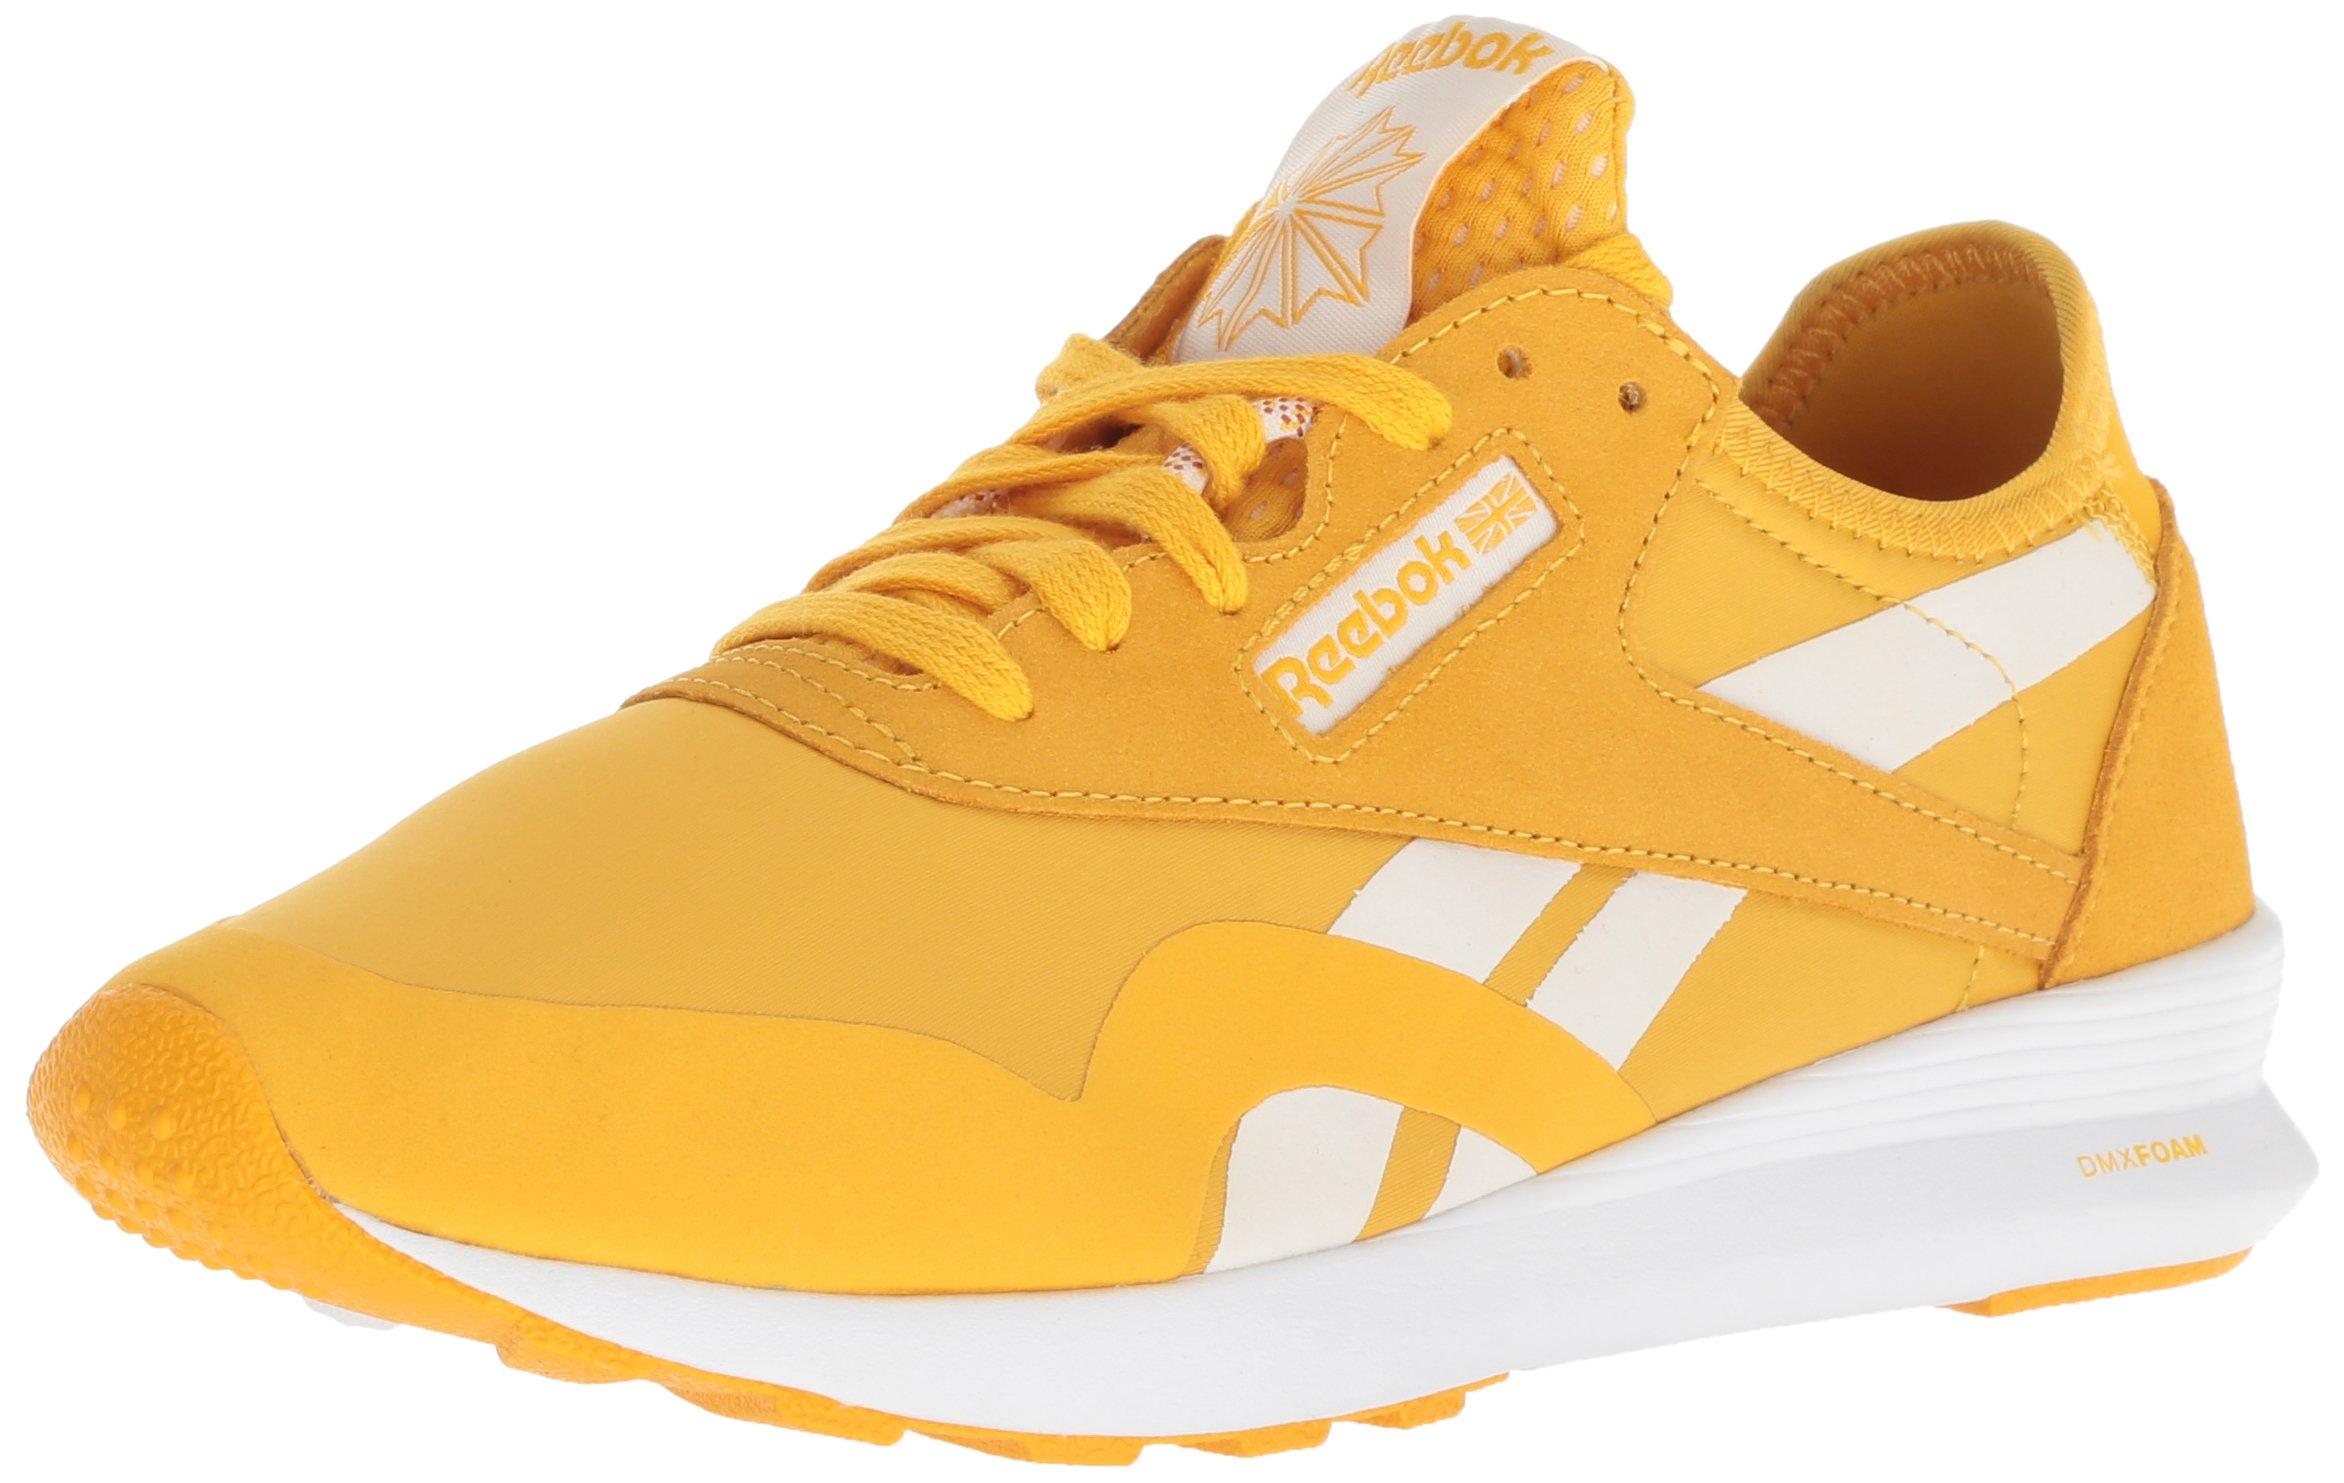 Reebok Women's Classic Nylon SP Walking Shoe, OG Blocking-Fierce Gold/Chalk/White, 8 M US